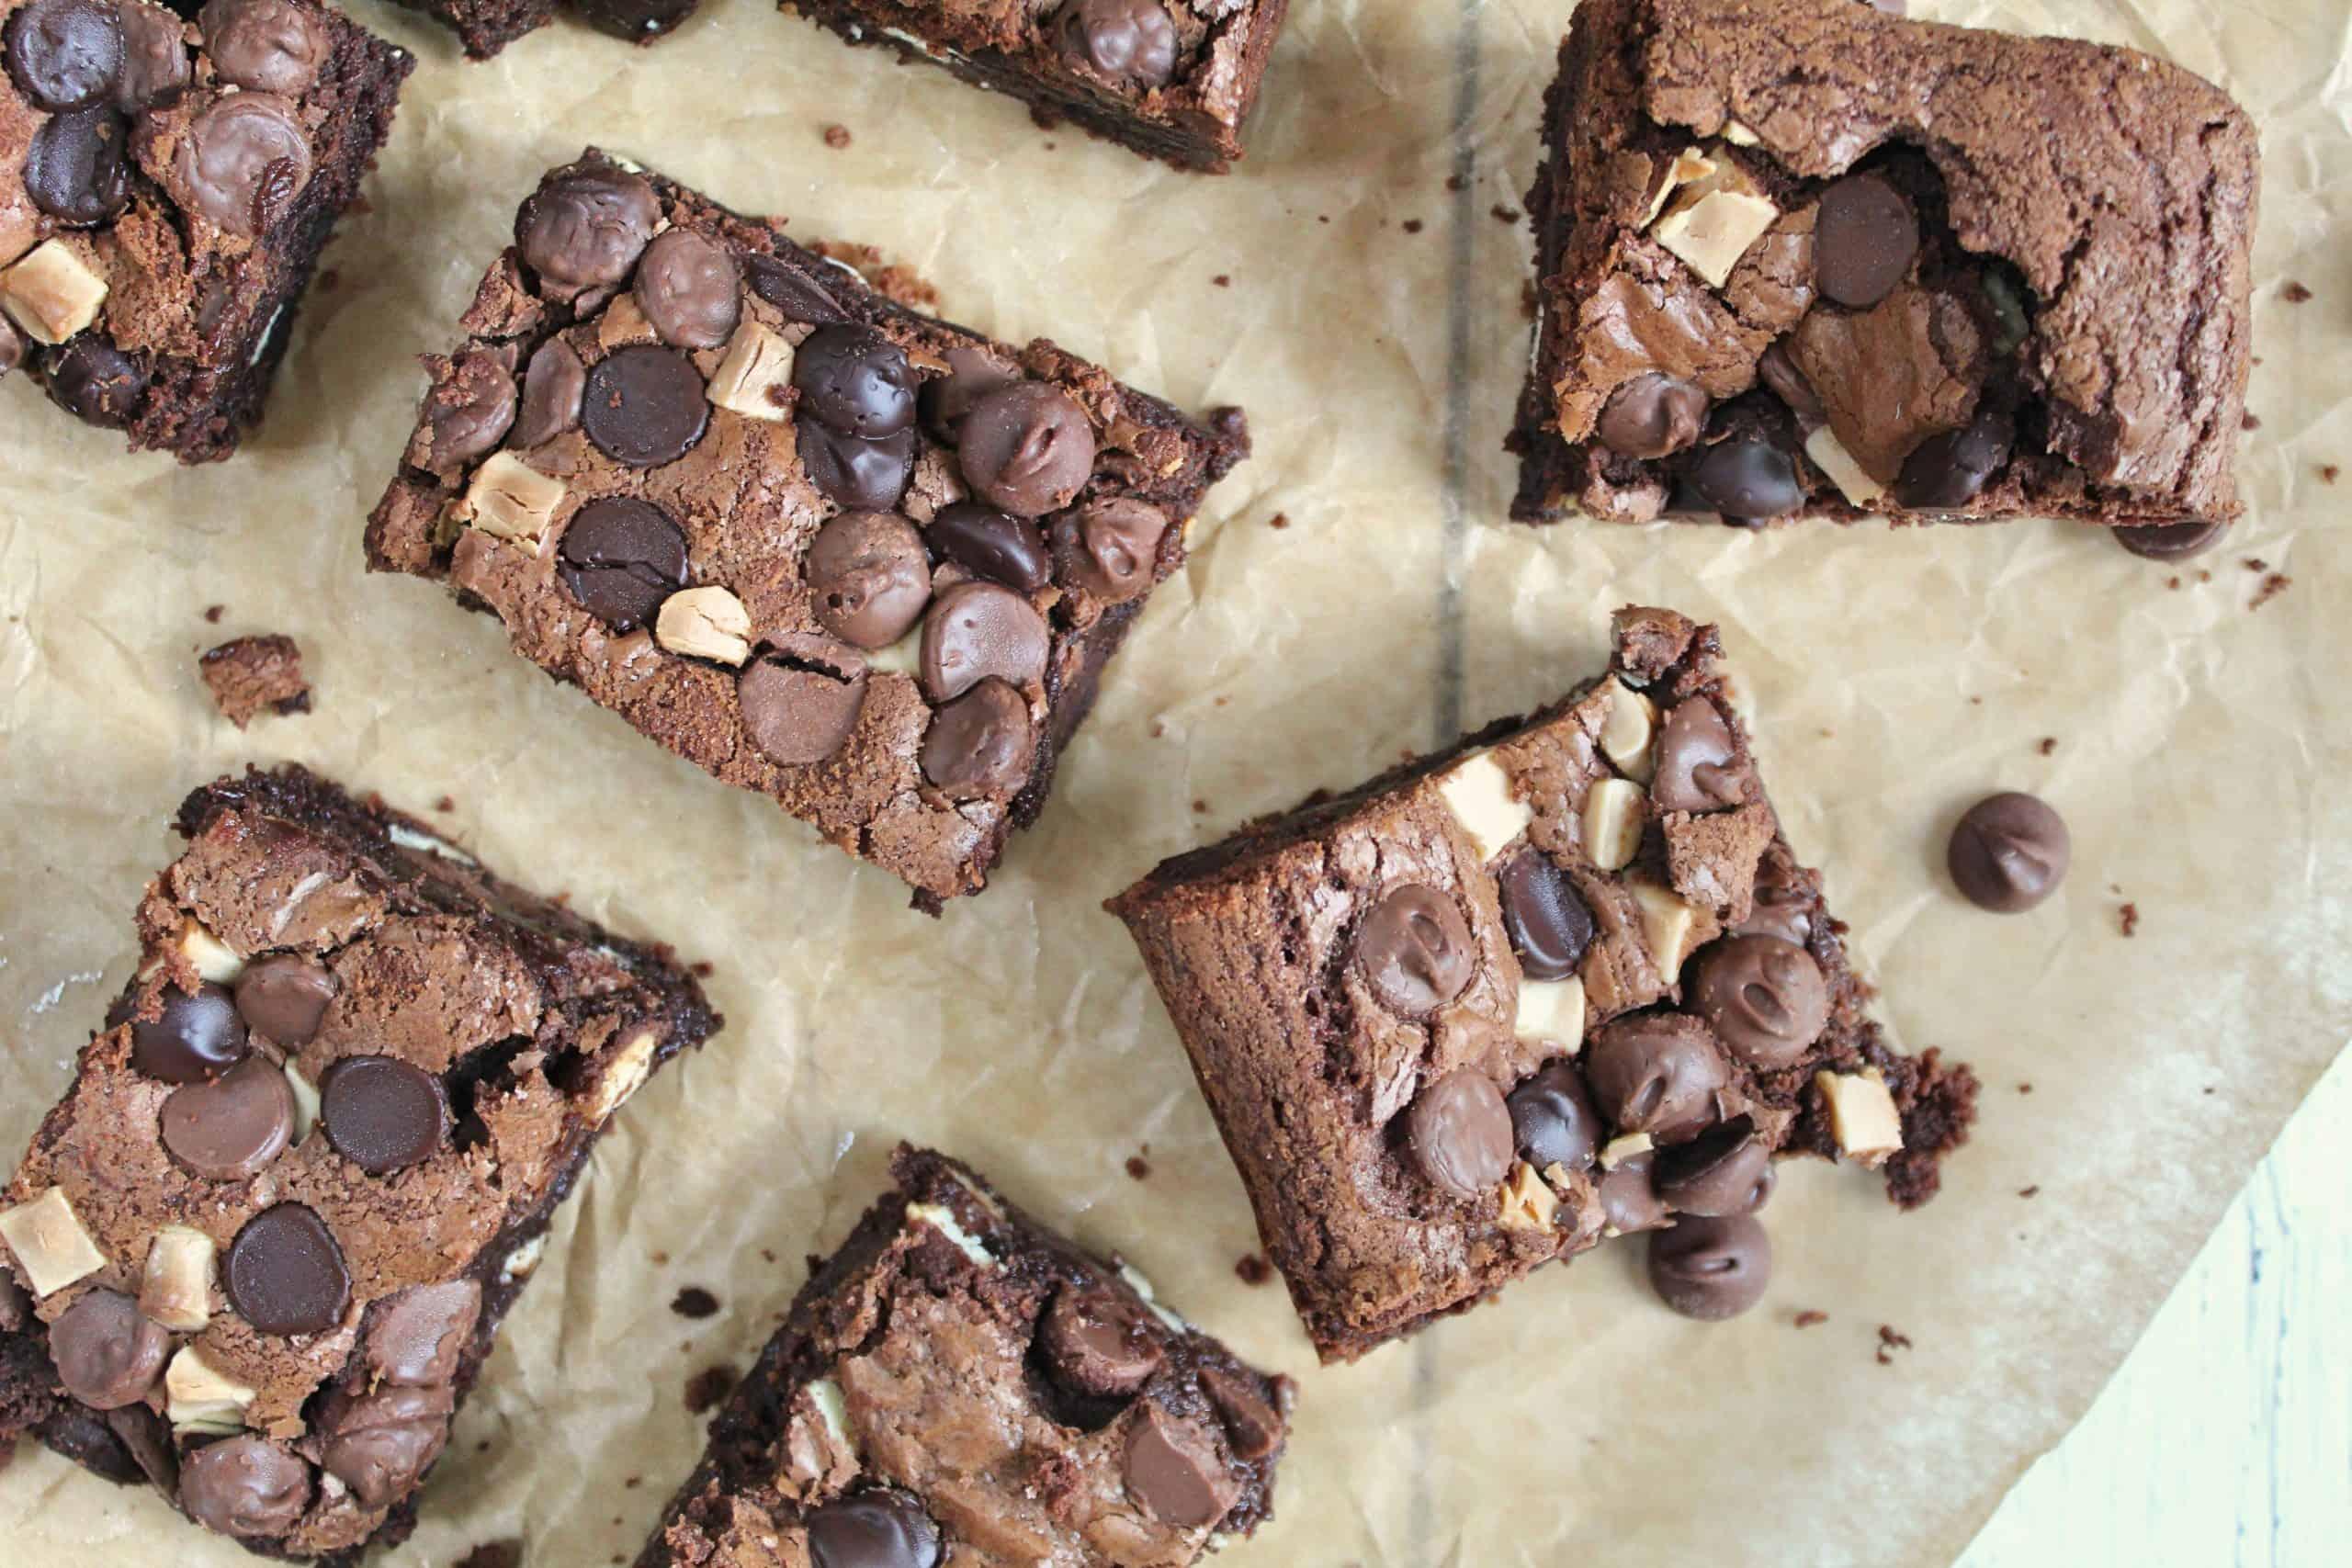 GLUTEN FREE CHOCOLATE BROWNIE RECIPE 69